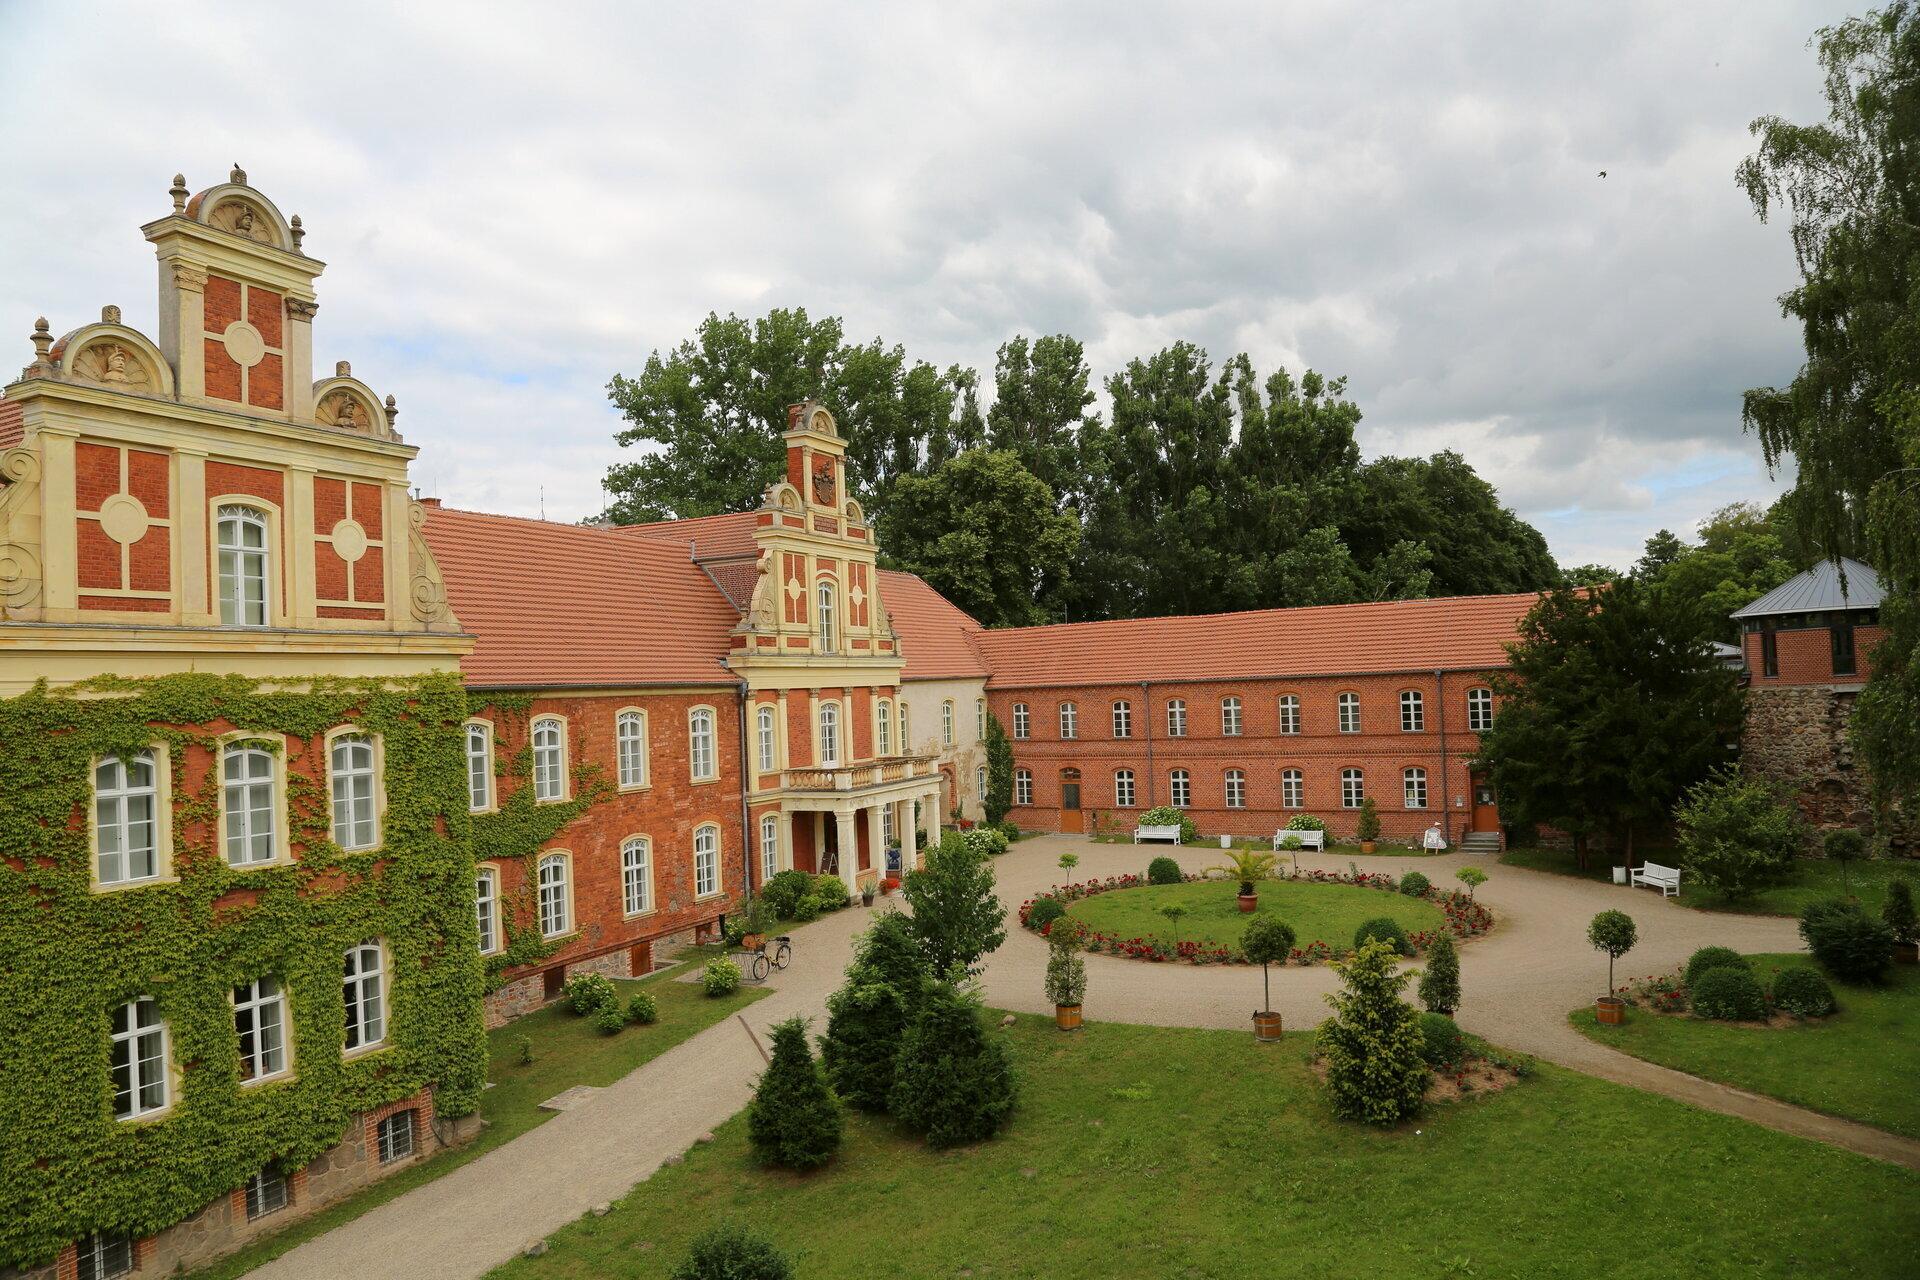 Schloss Meyenburg